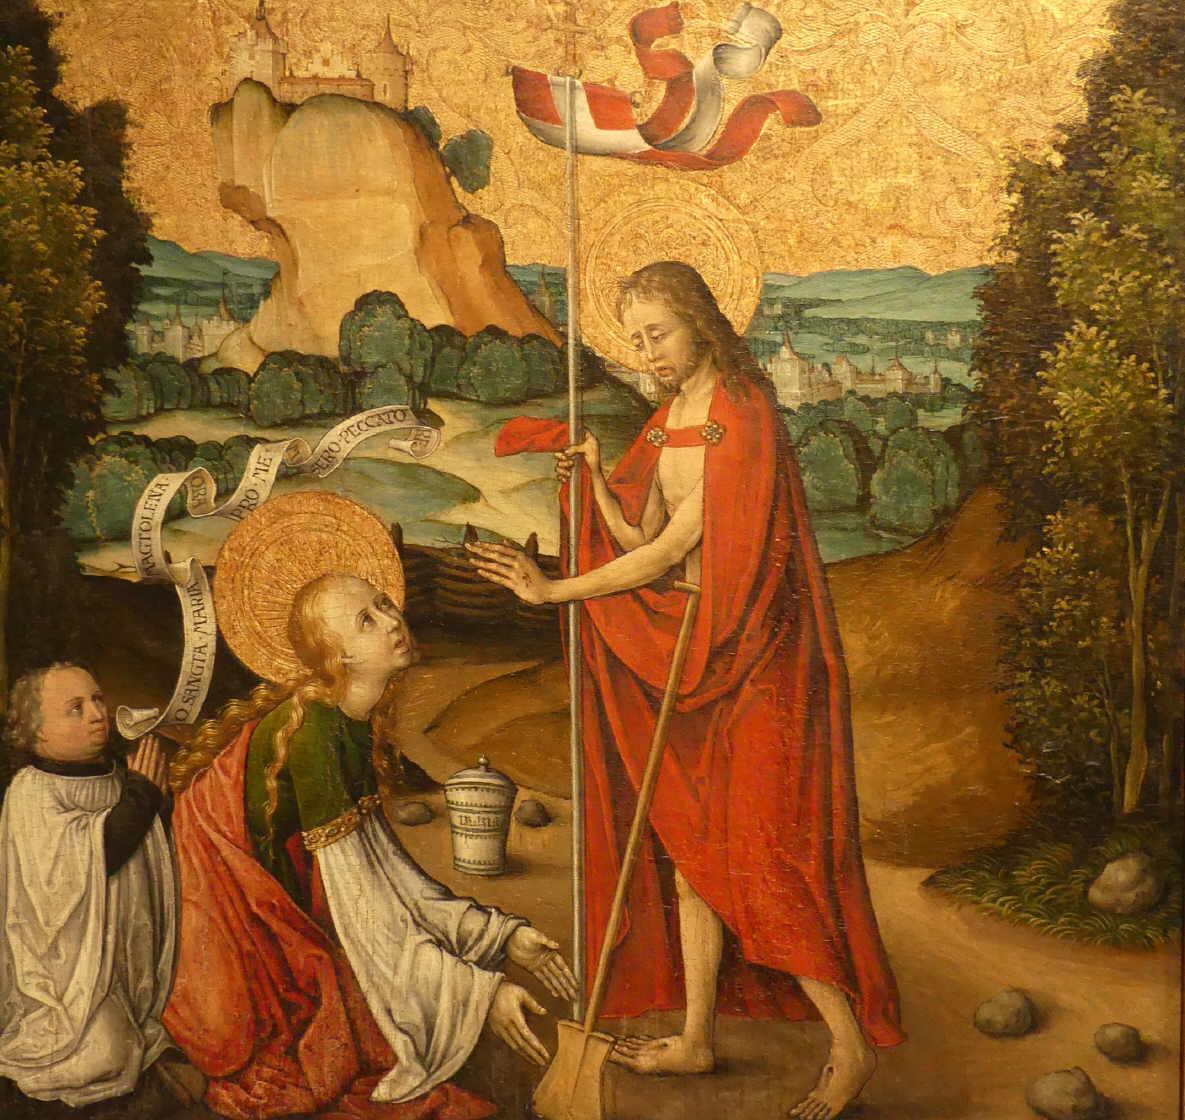 Christus begegnet am Ostermorgen Maria Magdalena,